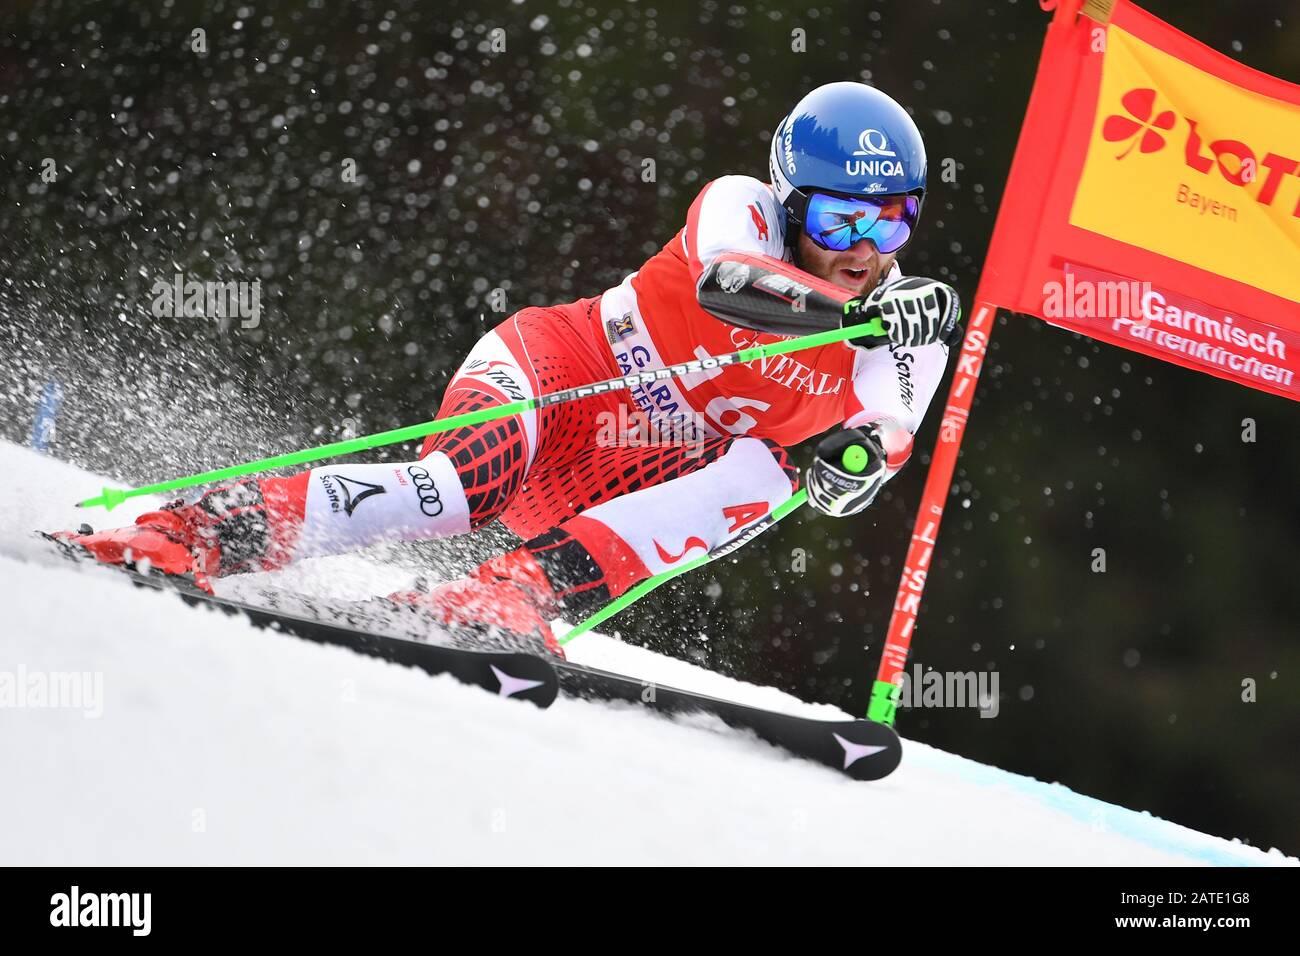 Marco SCHWARZ (AUT), action. Alpine skiing: men's giant slalom/Kandahar race in Garmisch Partenkirchen on 02.02.2019.   usage worldwide Stock Photo